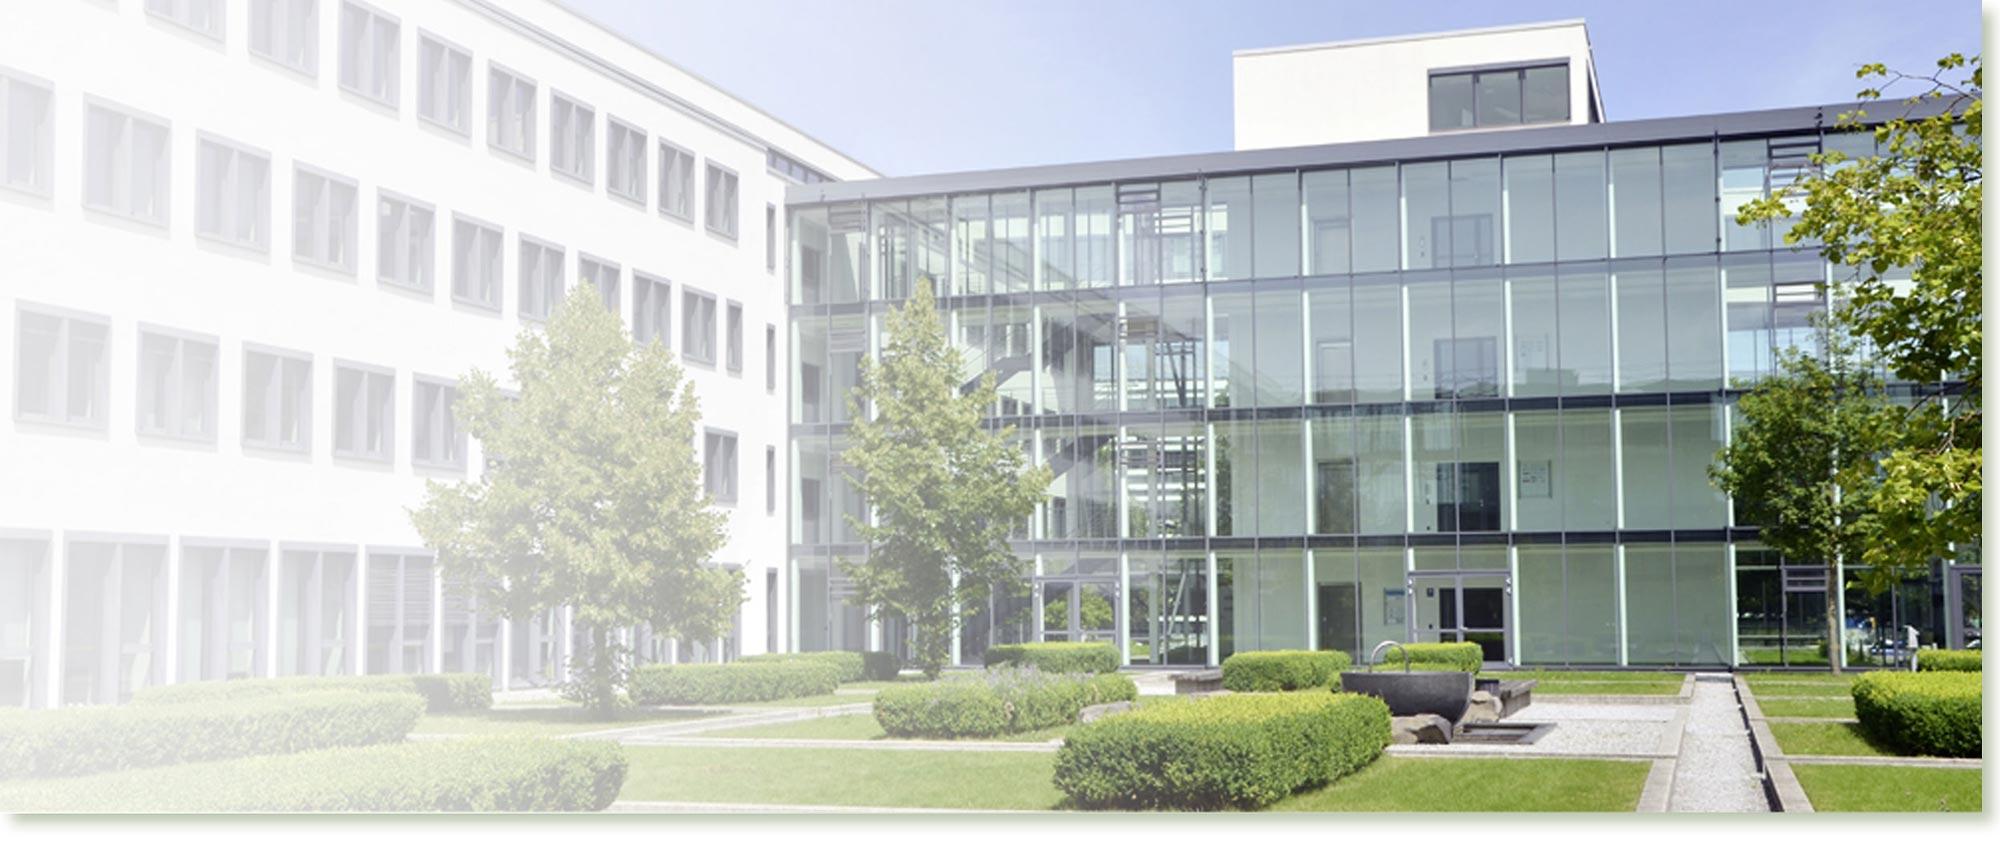 HeadImage | Unternehmen [formula] Müller-Wohlfahrt AG